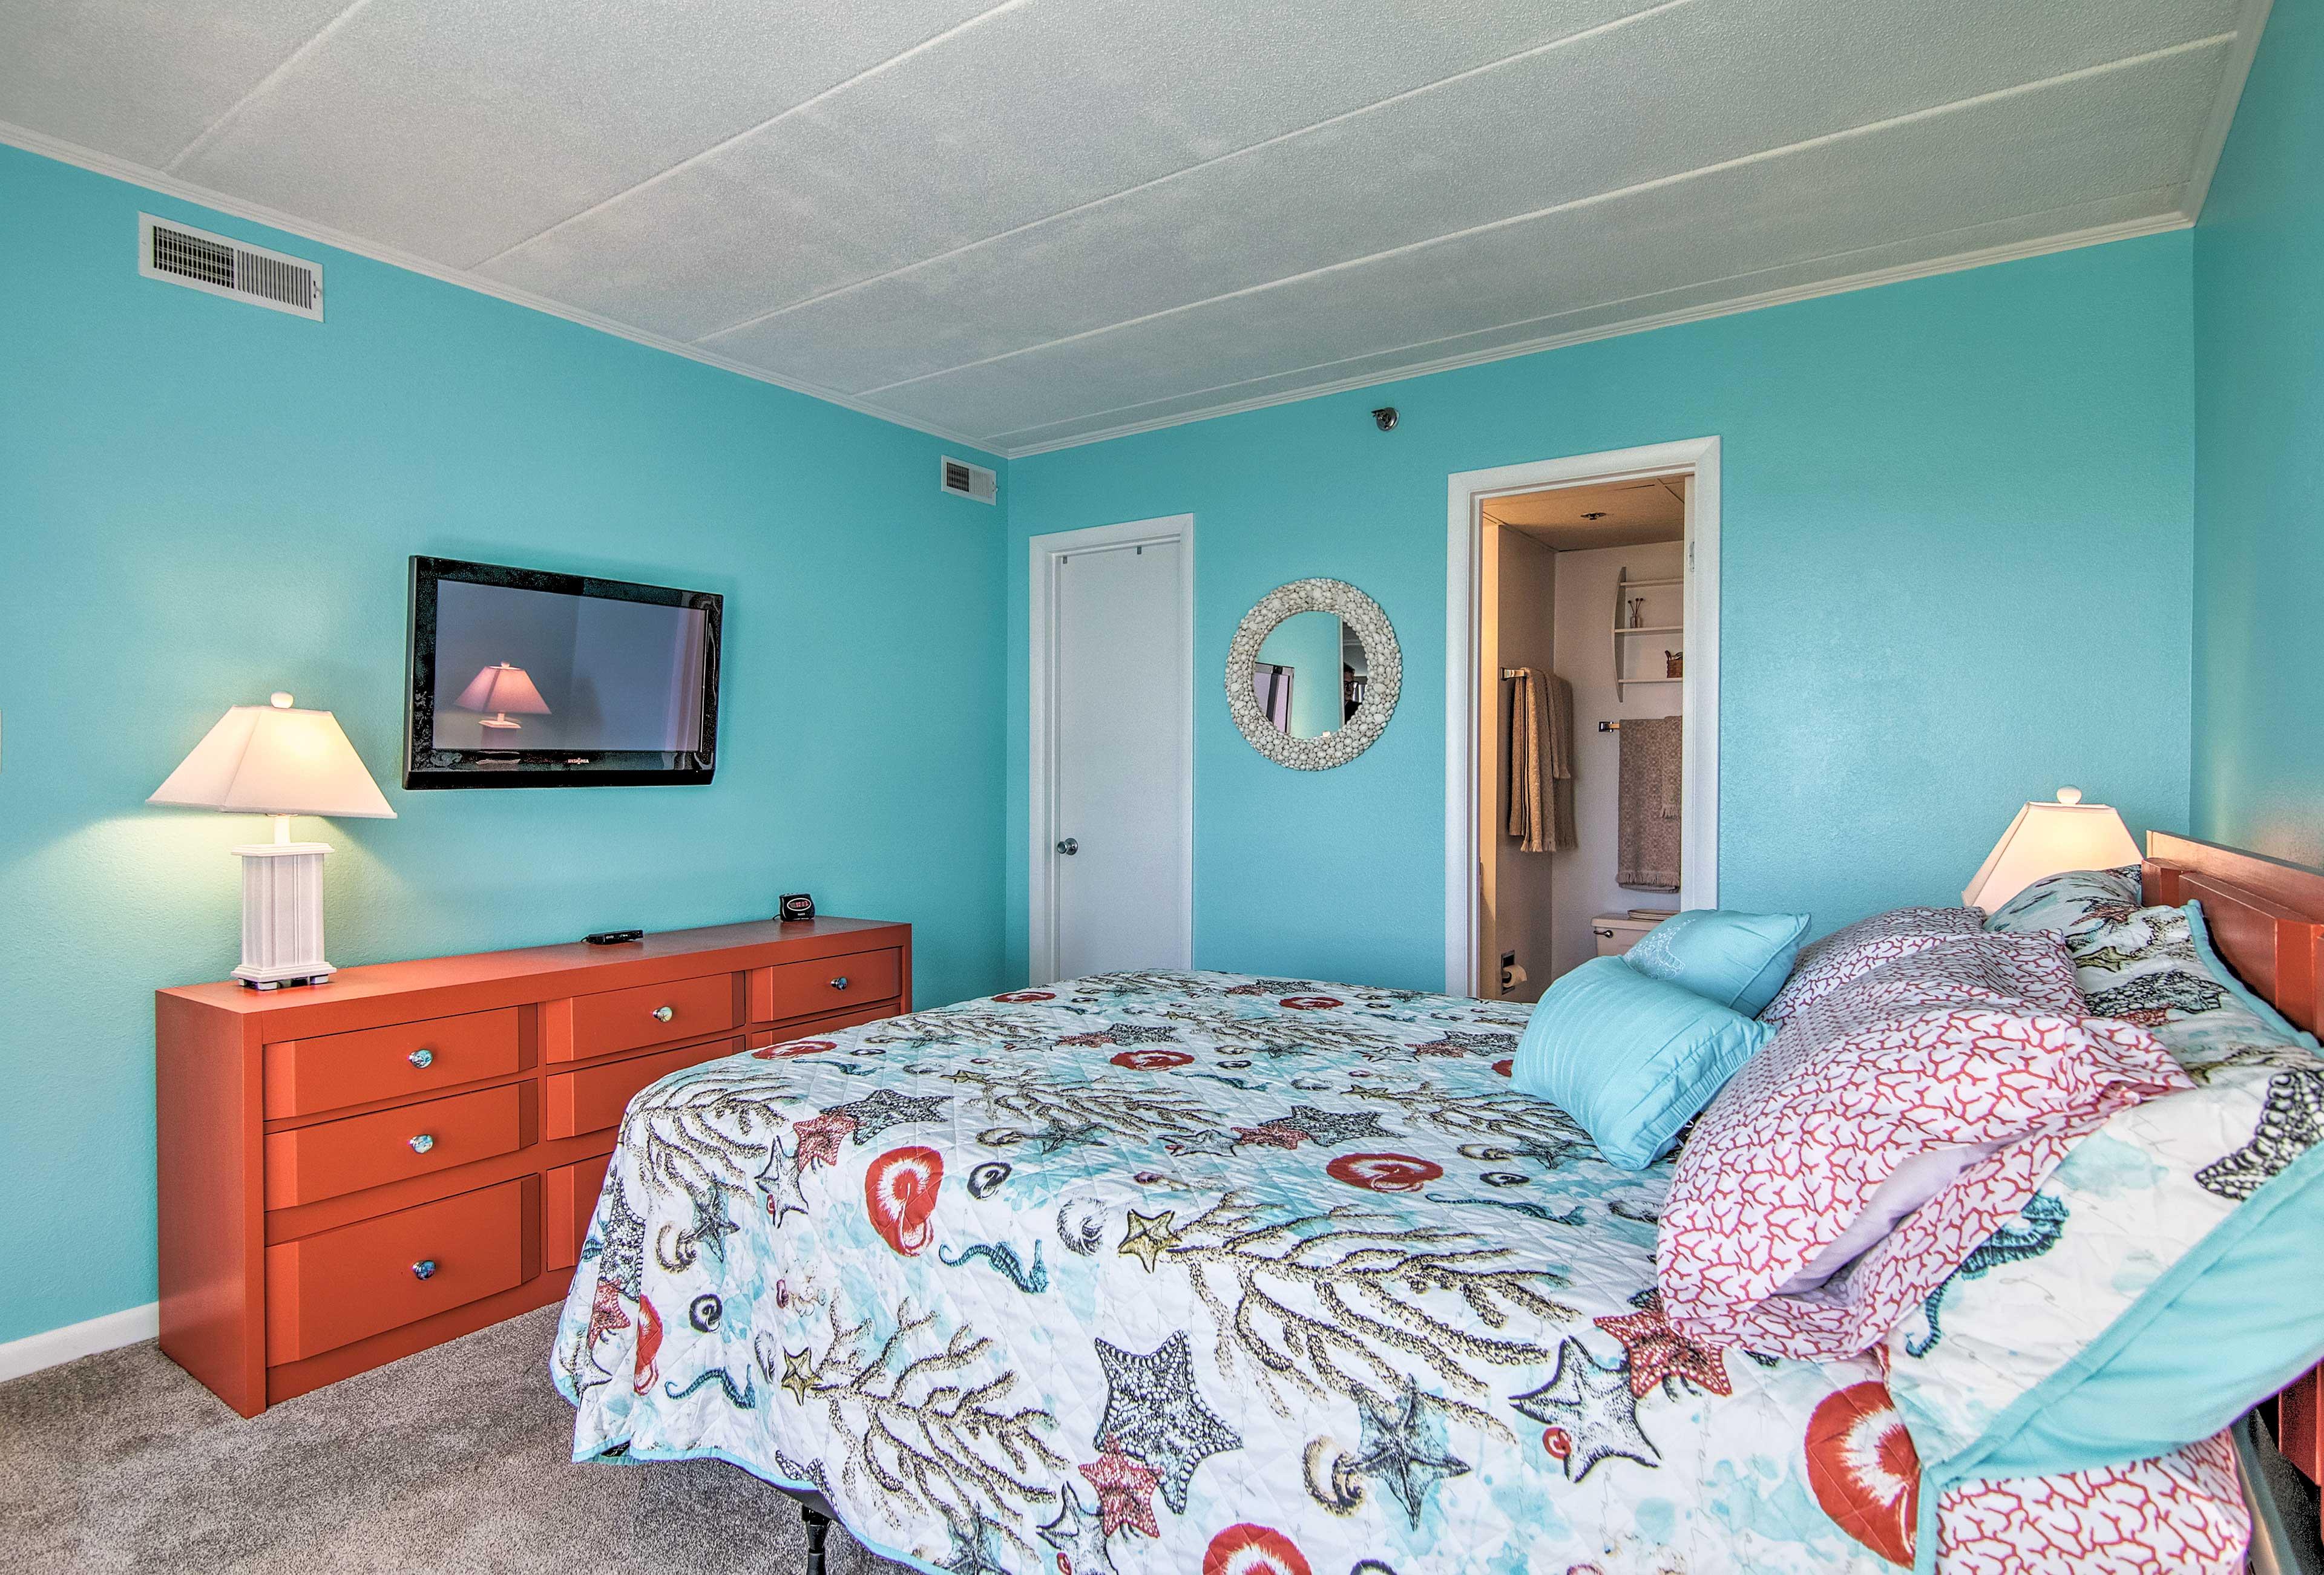 The master bedroom also includes an en-suite bathroom.